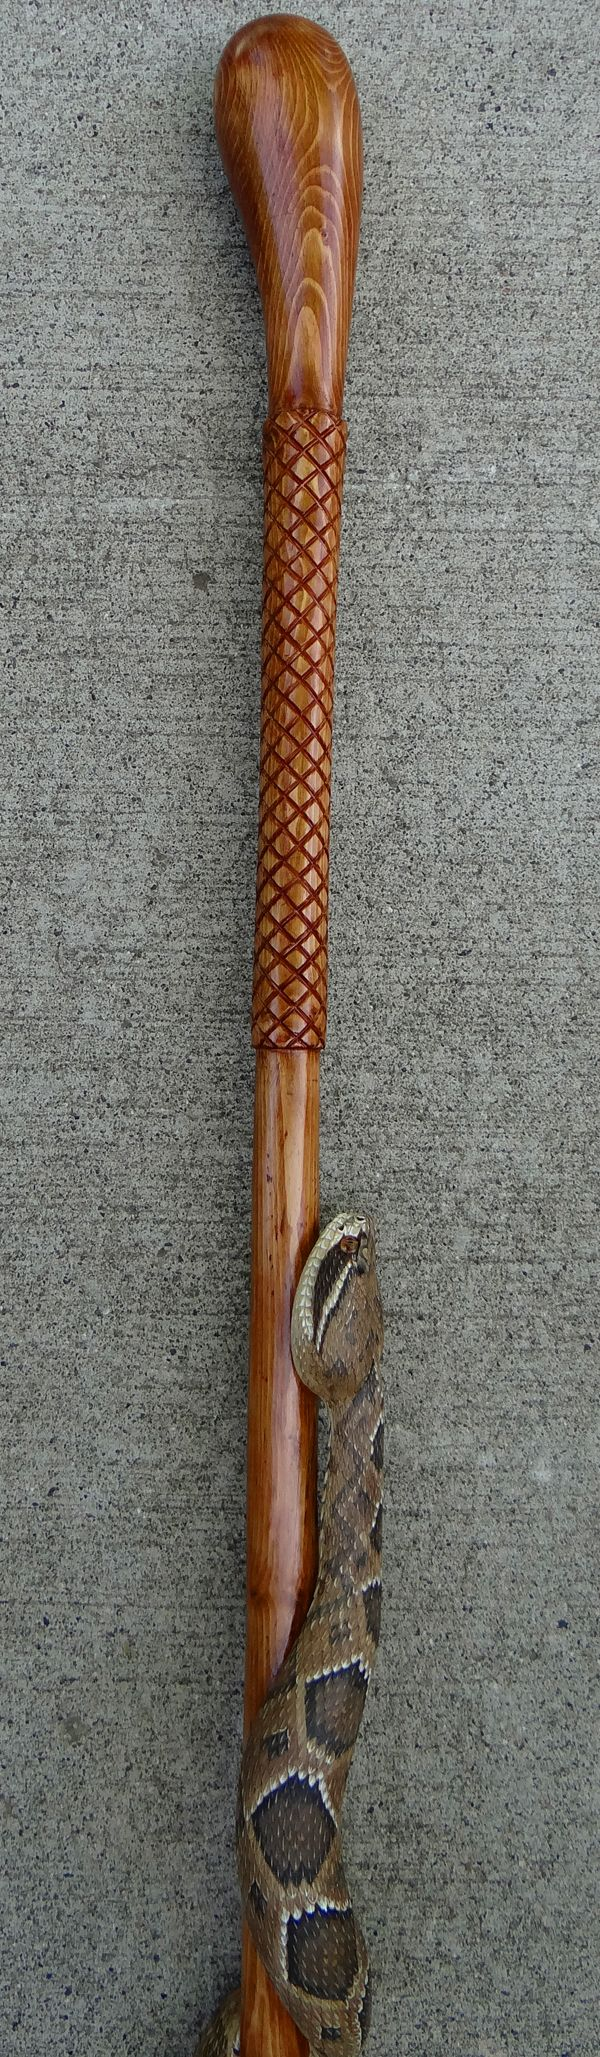 stick35 031